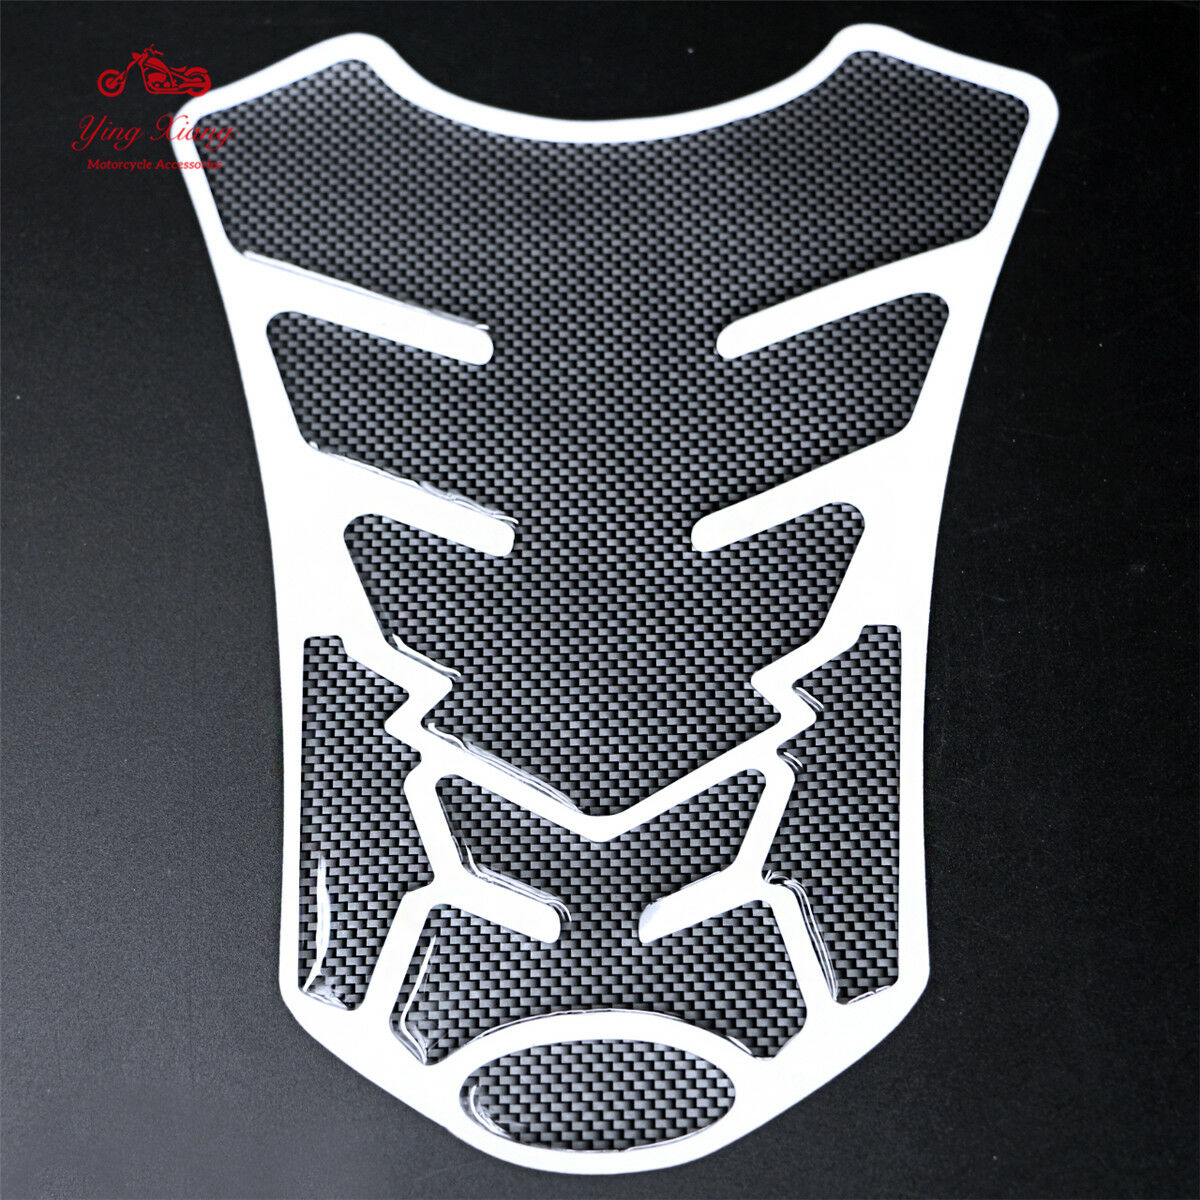 Fuel Tank Decal Pad Gas Cap Sticker Protector For Honda Suzuki Kawasaki Yamaha